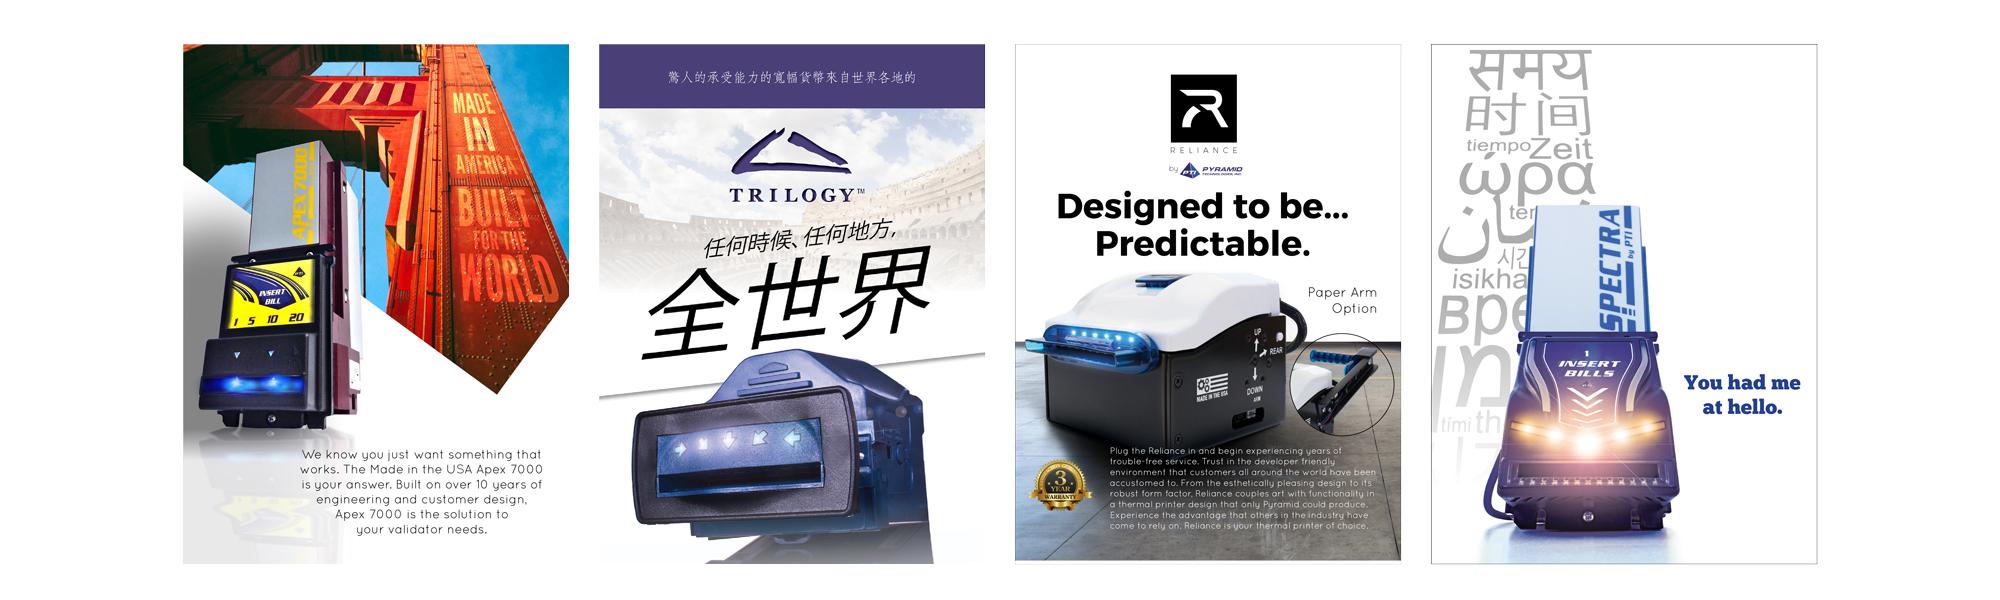 Pyramid Technology, Mesa, AZ  Product line 1-pagers